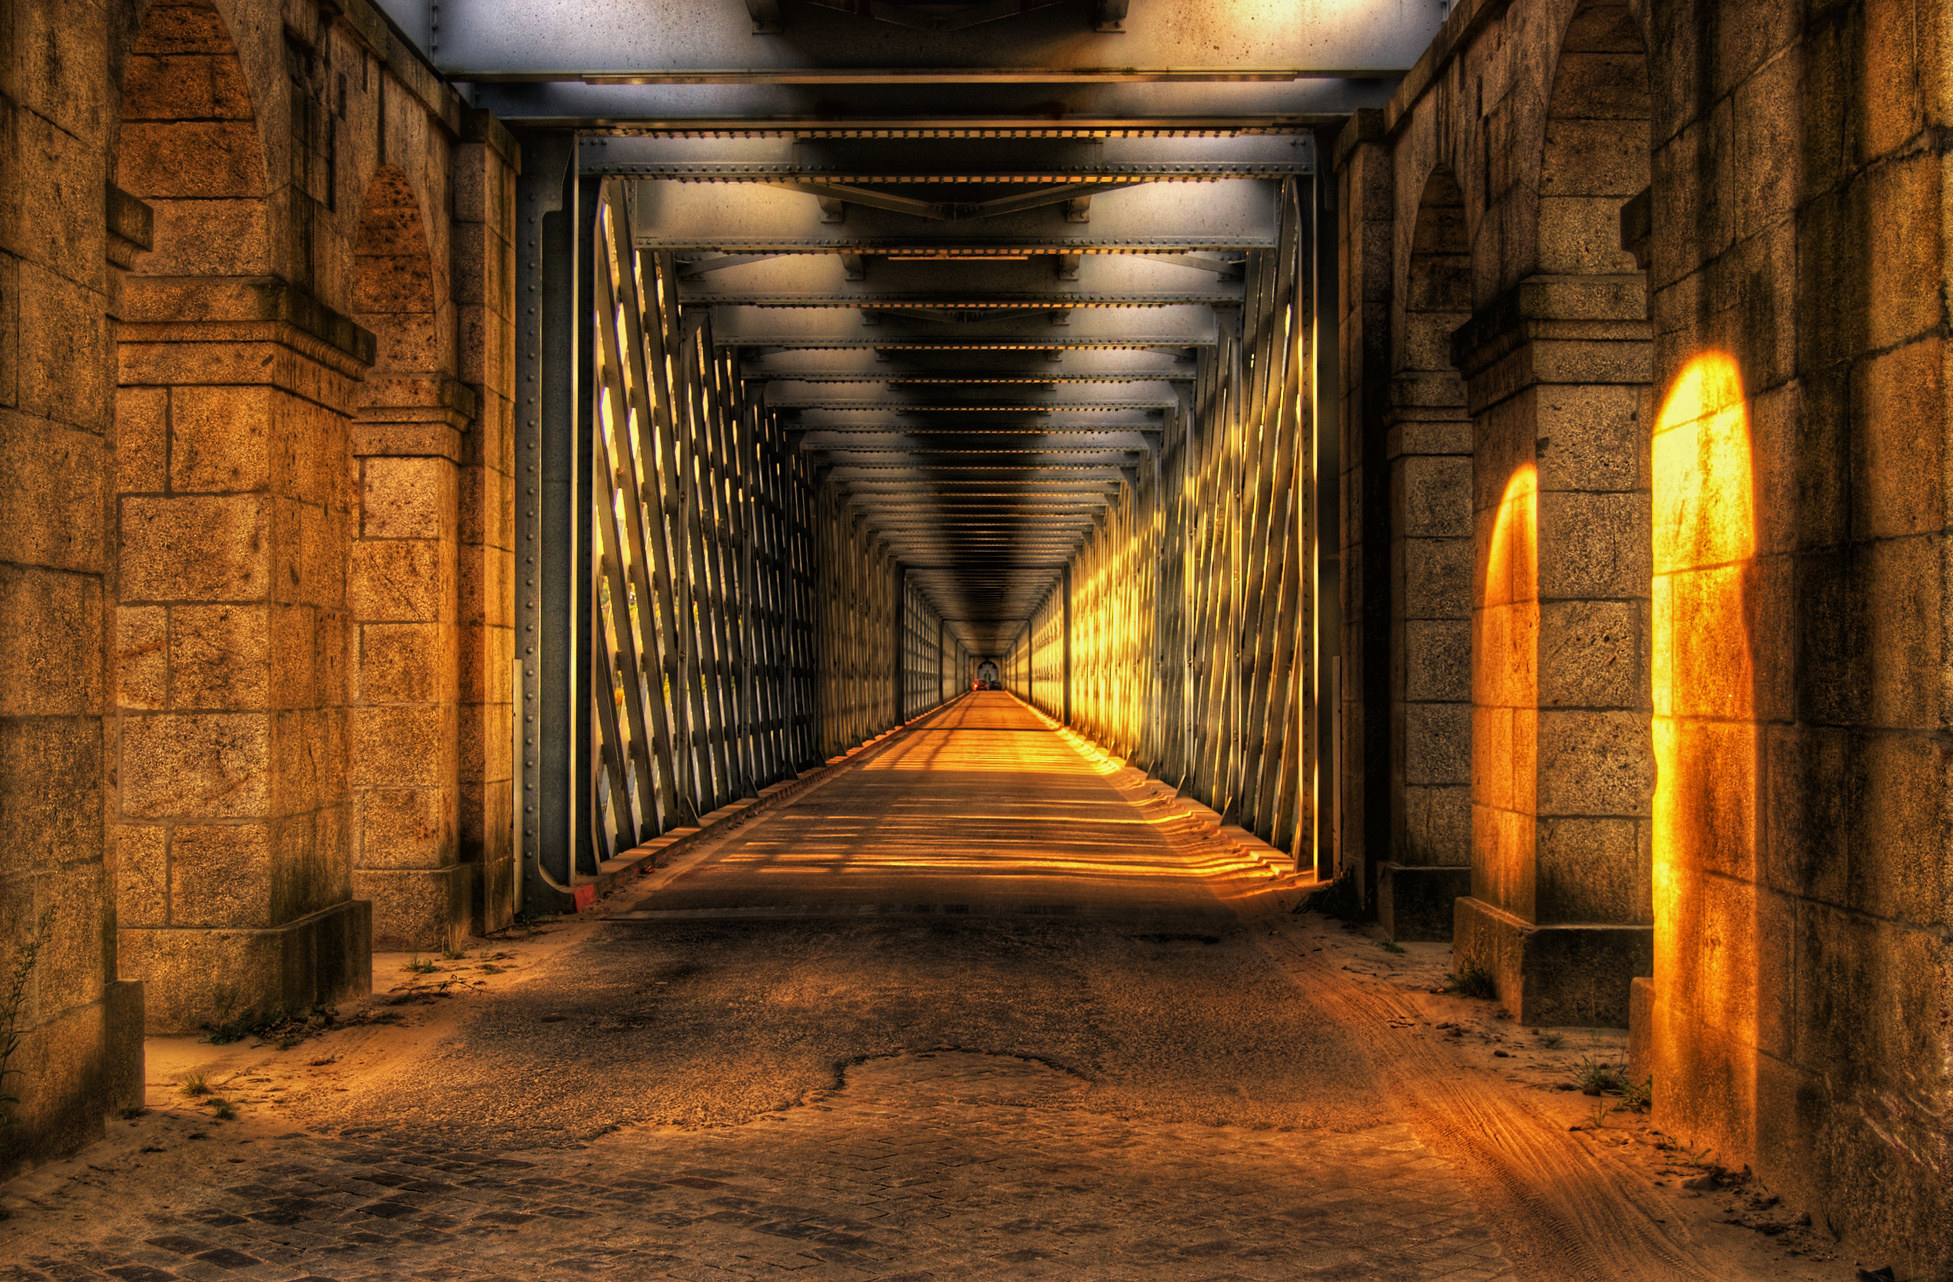 Wallpaper Brick 3d Long Hallway Hd Wallpaper Background Image 1953x1282